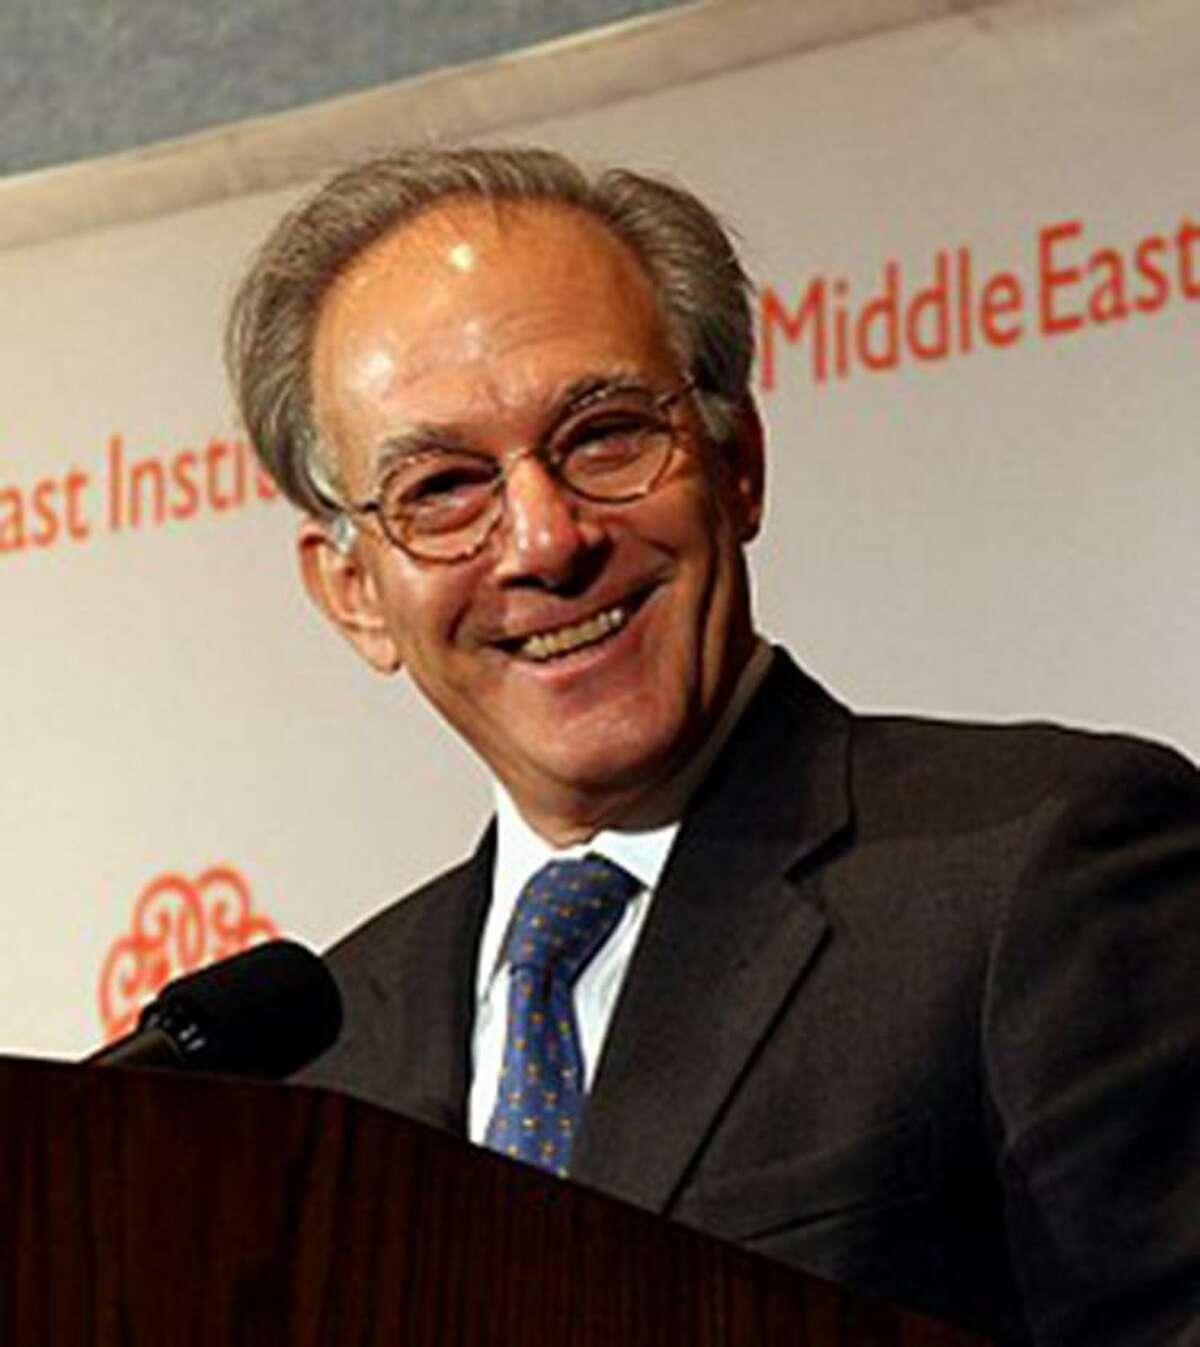 David Ignatius: The U.S. piece of this puzzle is the area east of the Euphrates.